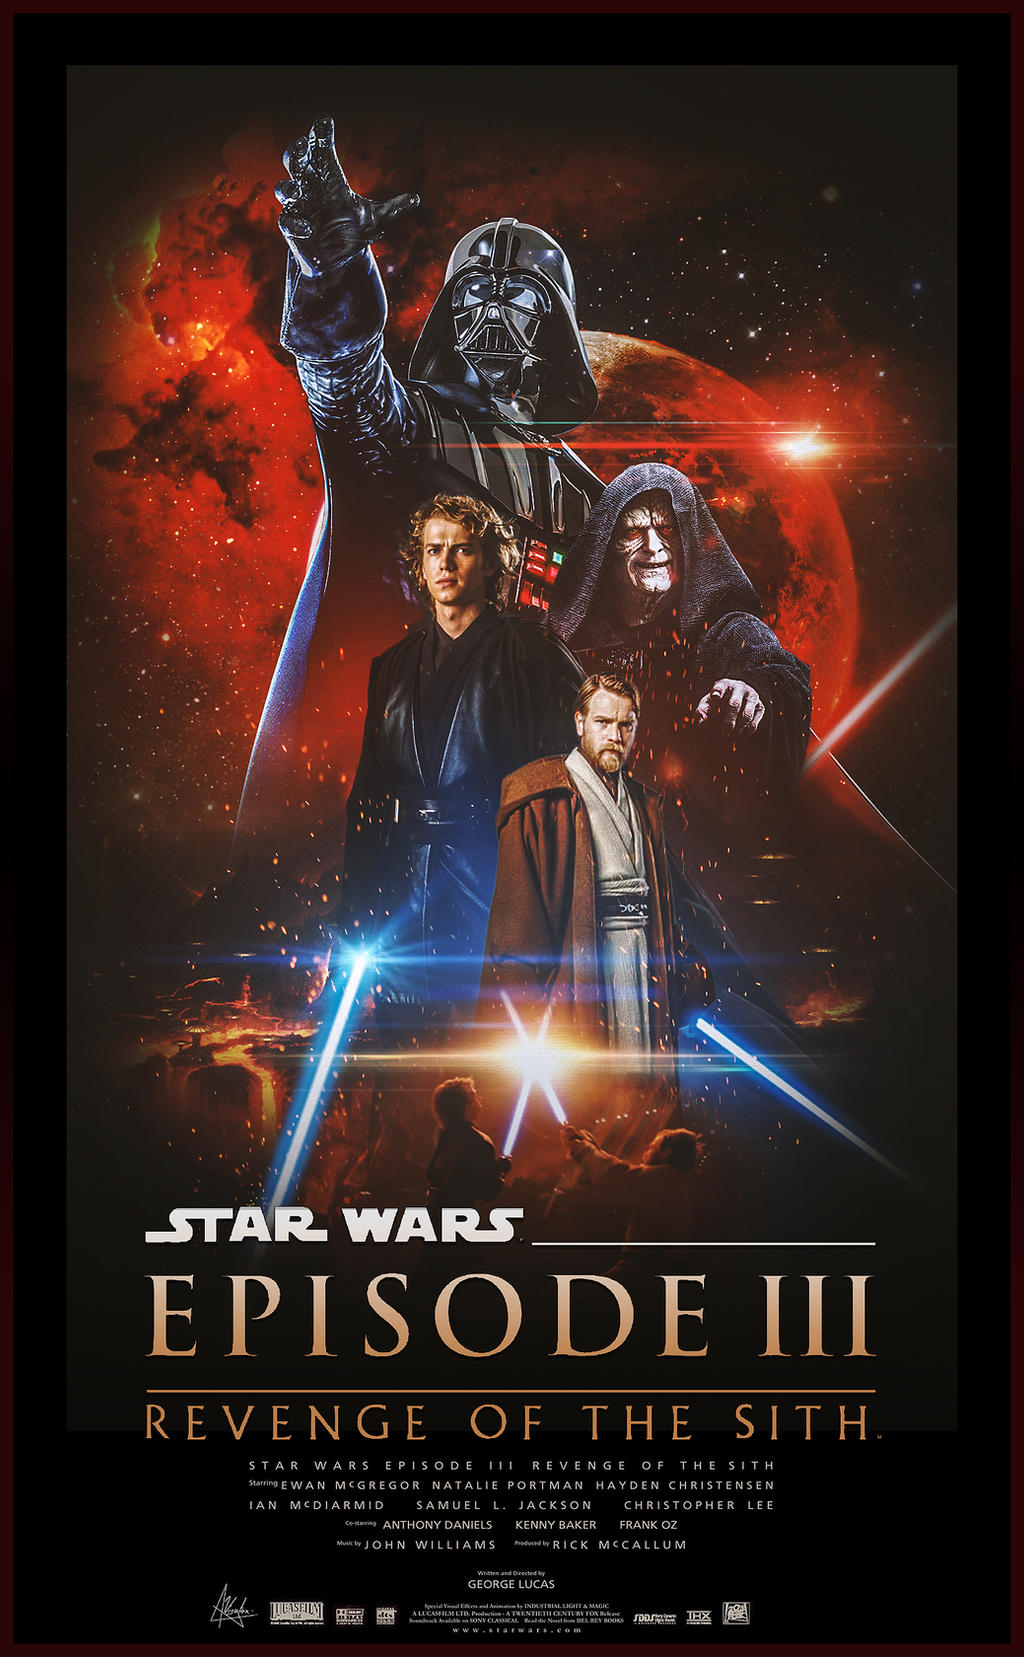 [PDF] Star Wars Episode Iii Revenge Of The Sith Full ...